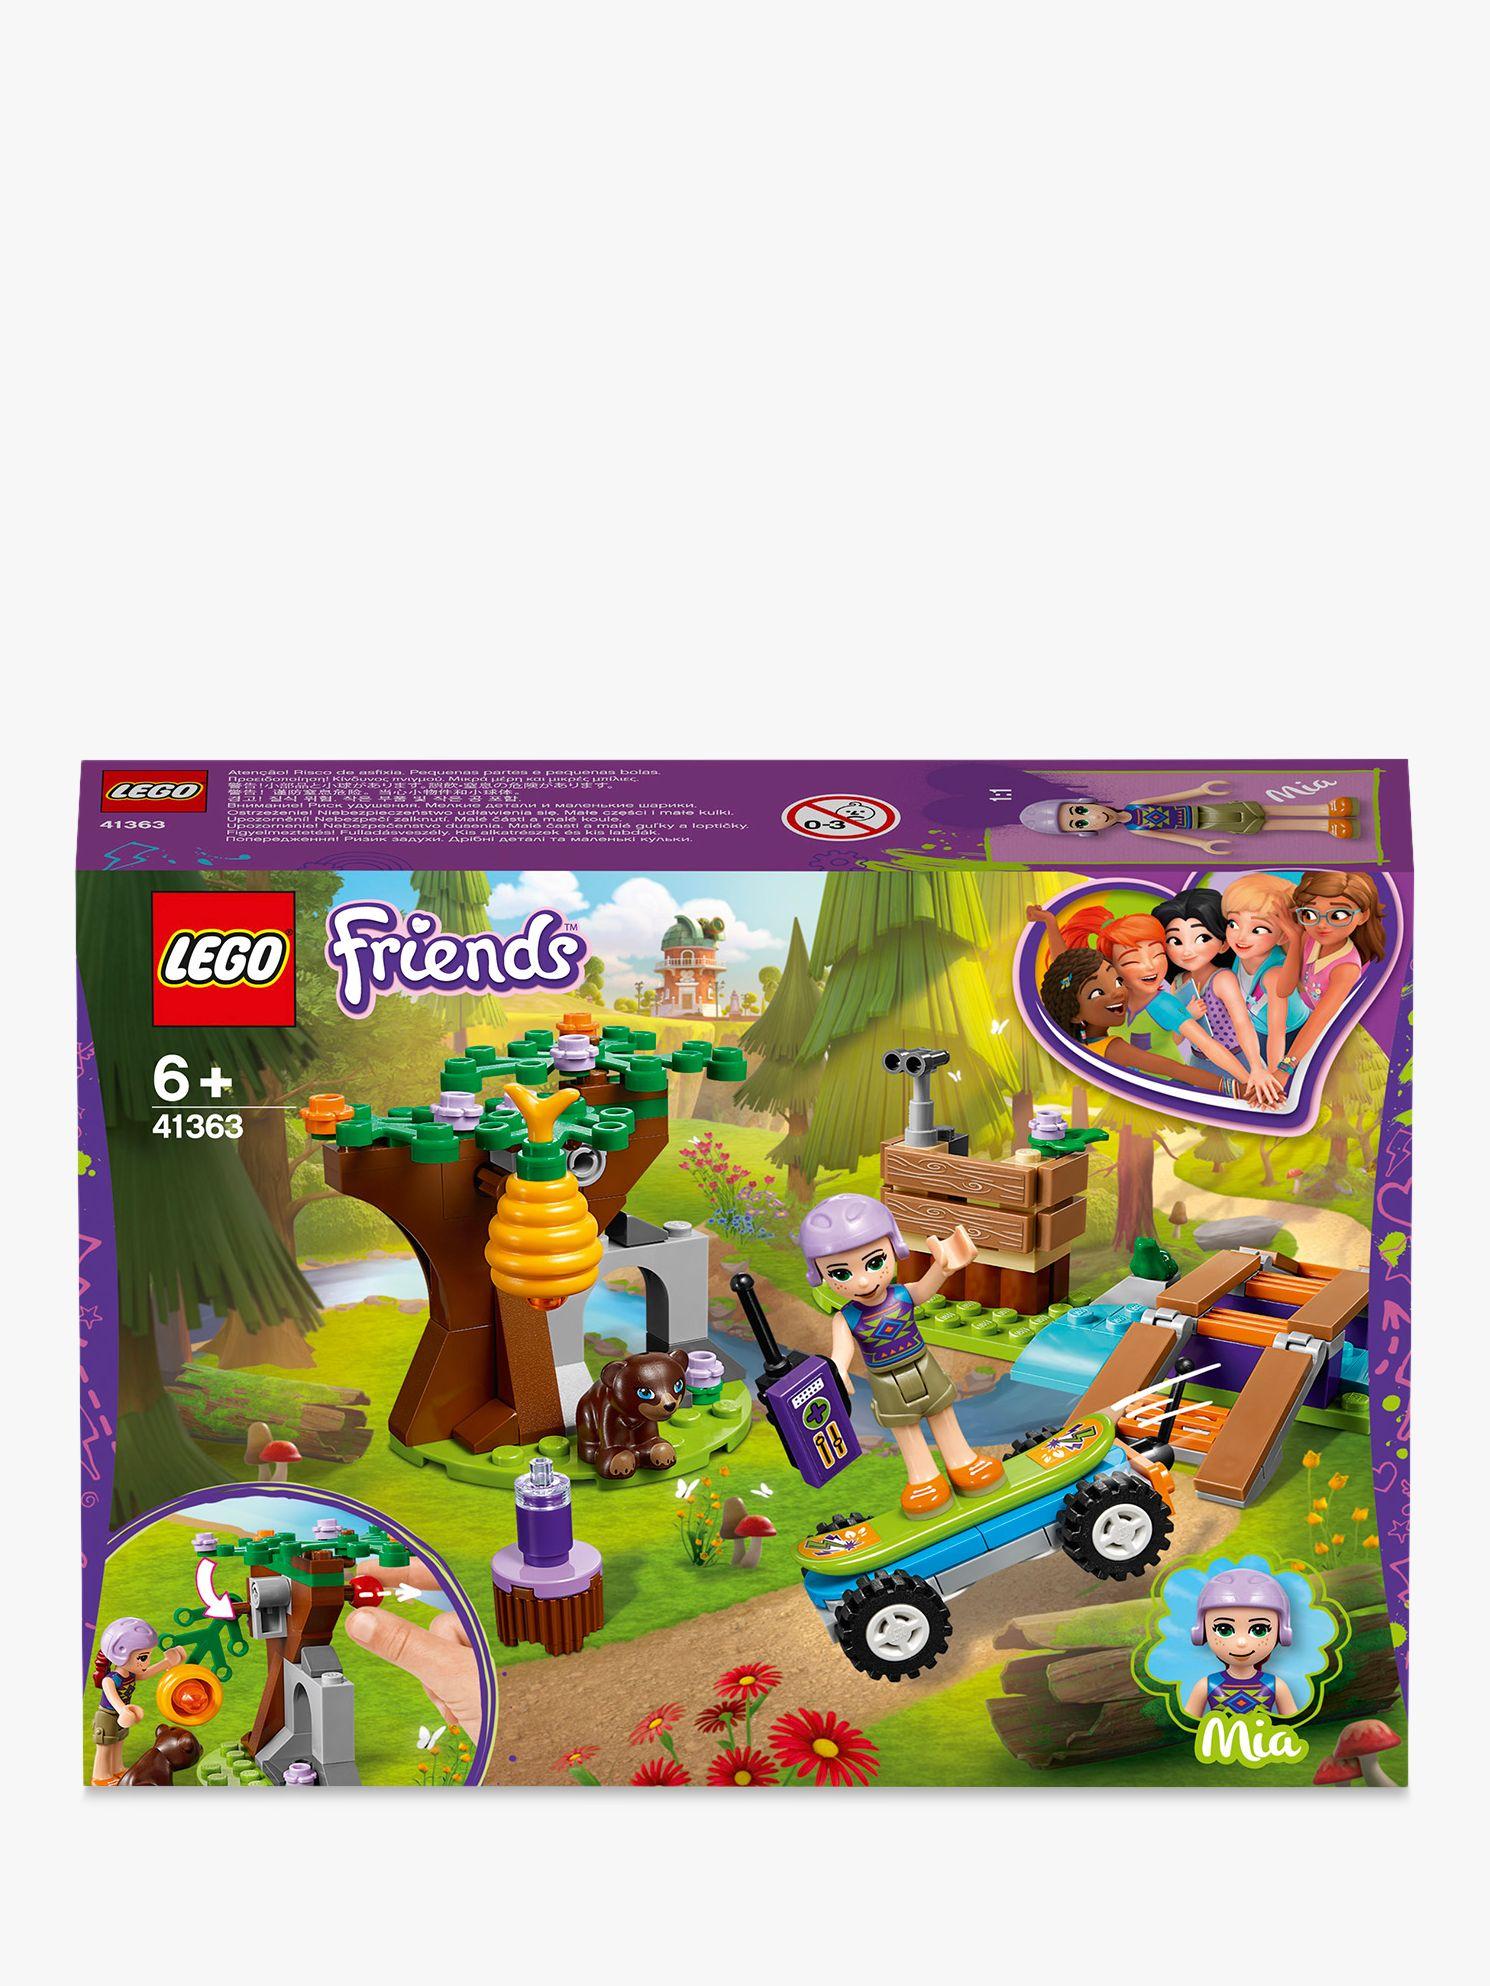 Lego FRIENDS-41363 Mia's Forest Adventure NEW